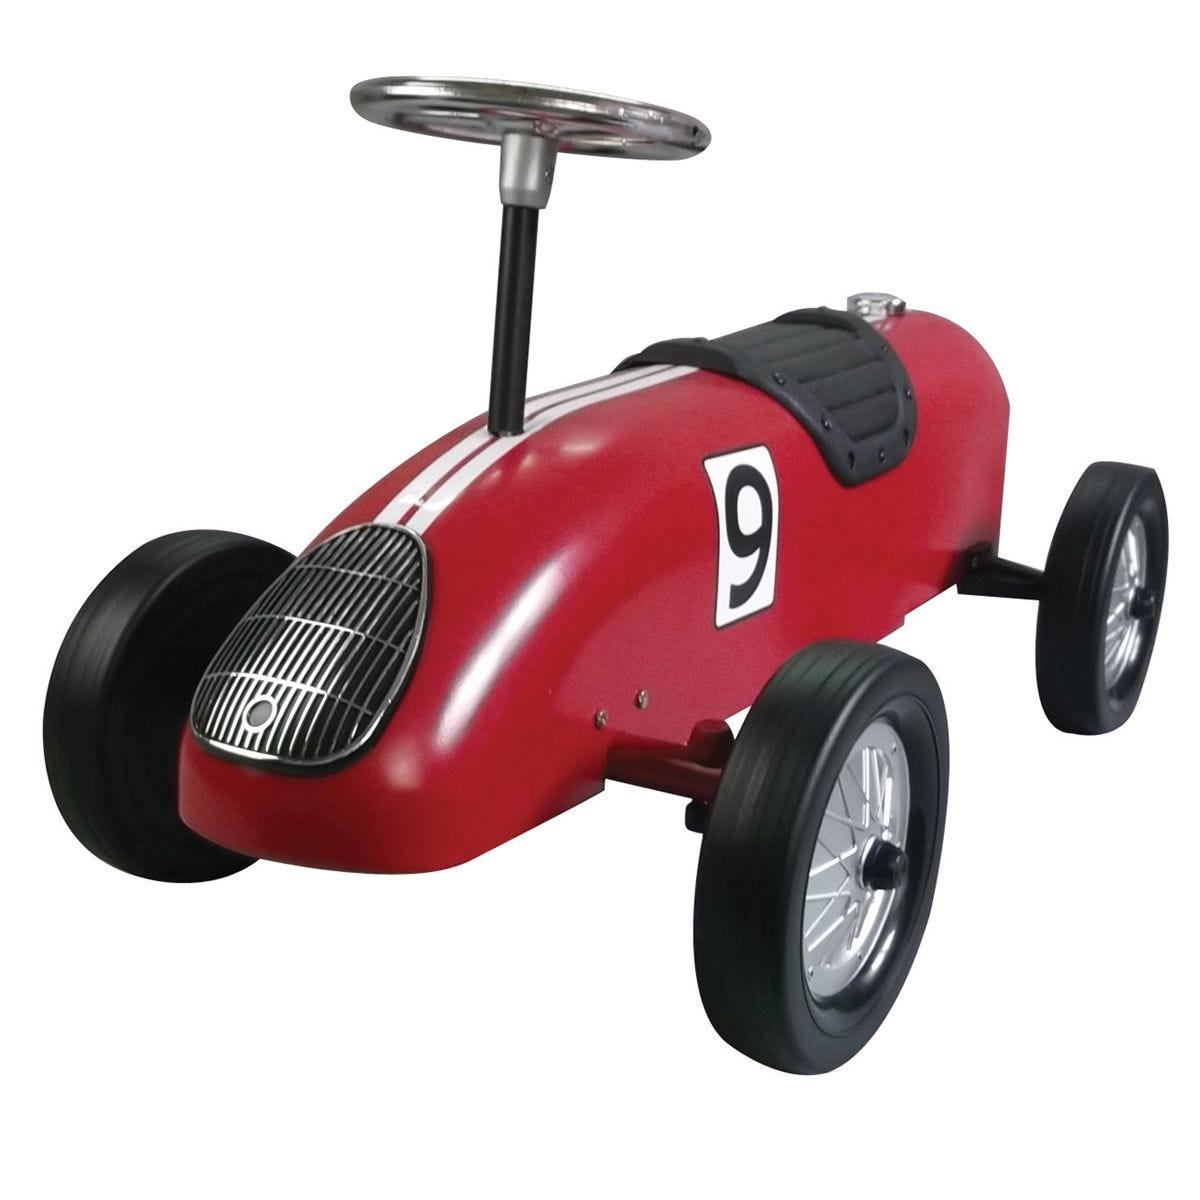 Retro Racer - Red